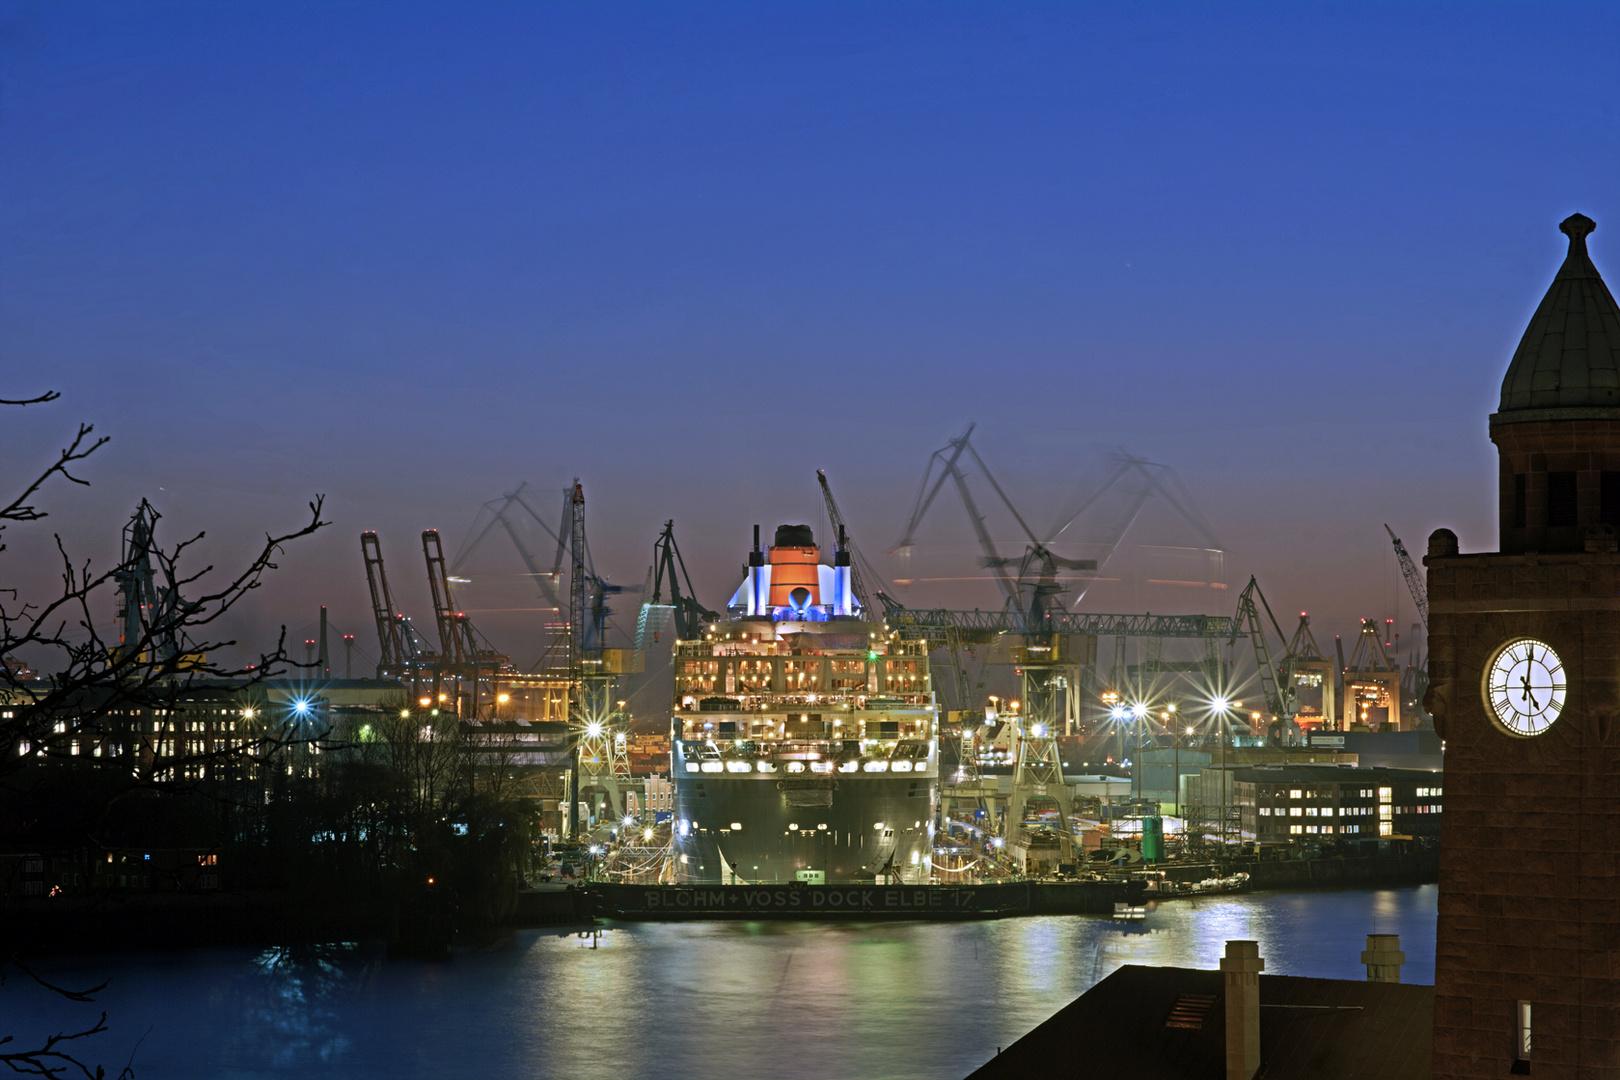 QM2 im Dock Elbe 17